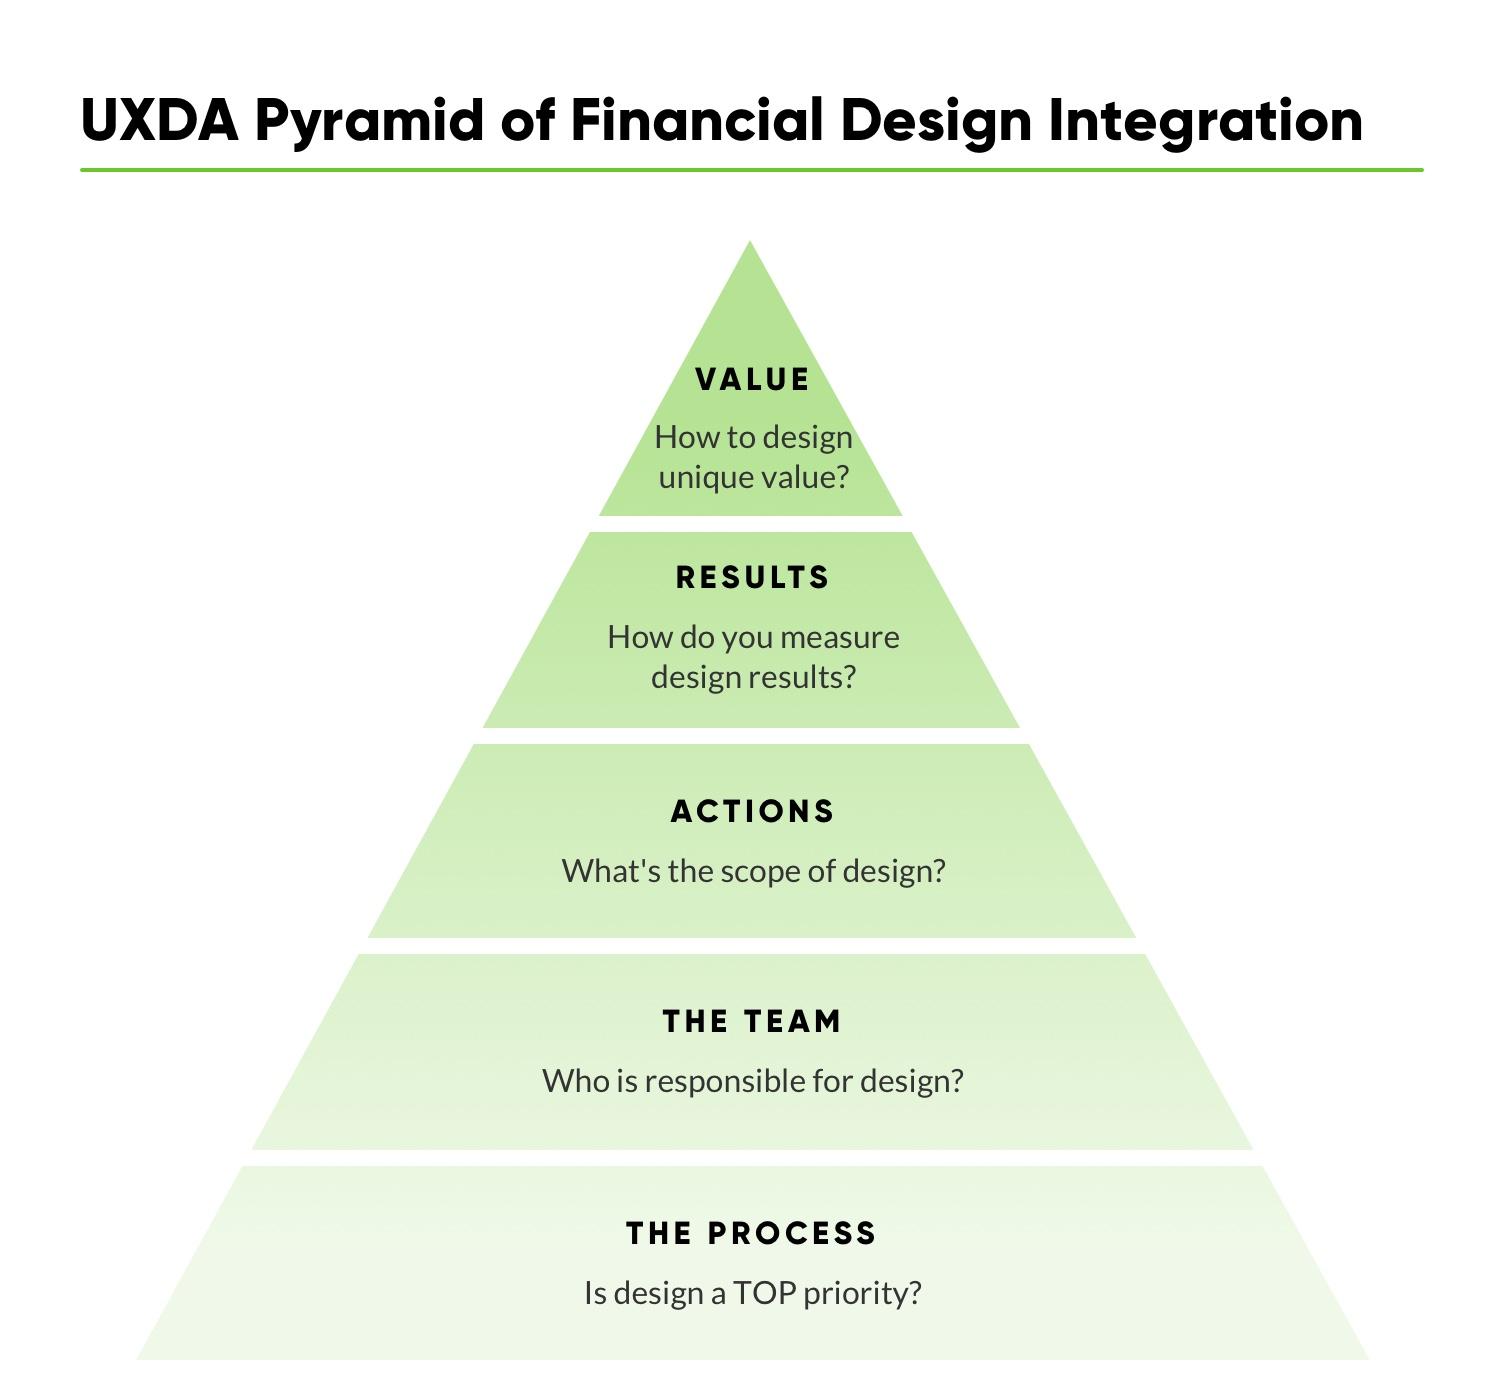 financial-ux-design-methodology-uxda-financial-design-integration-5-S.jpg